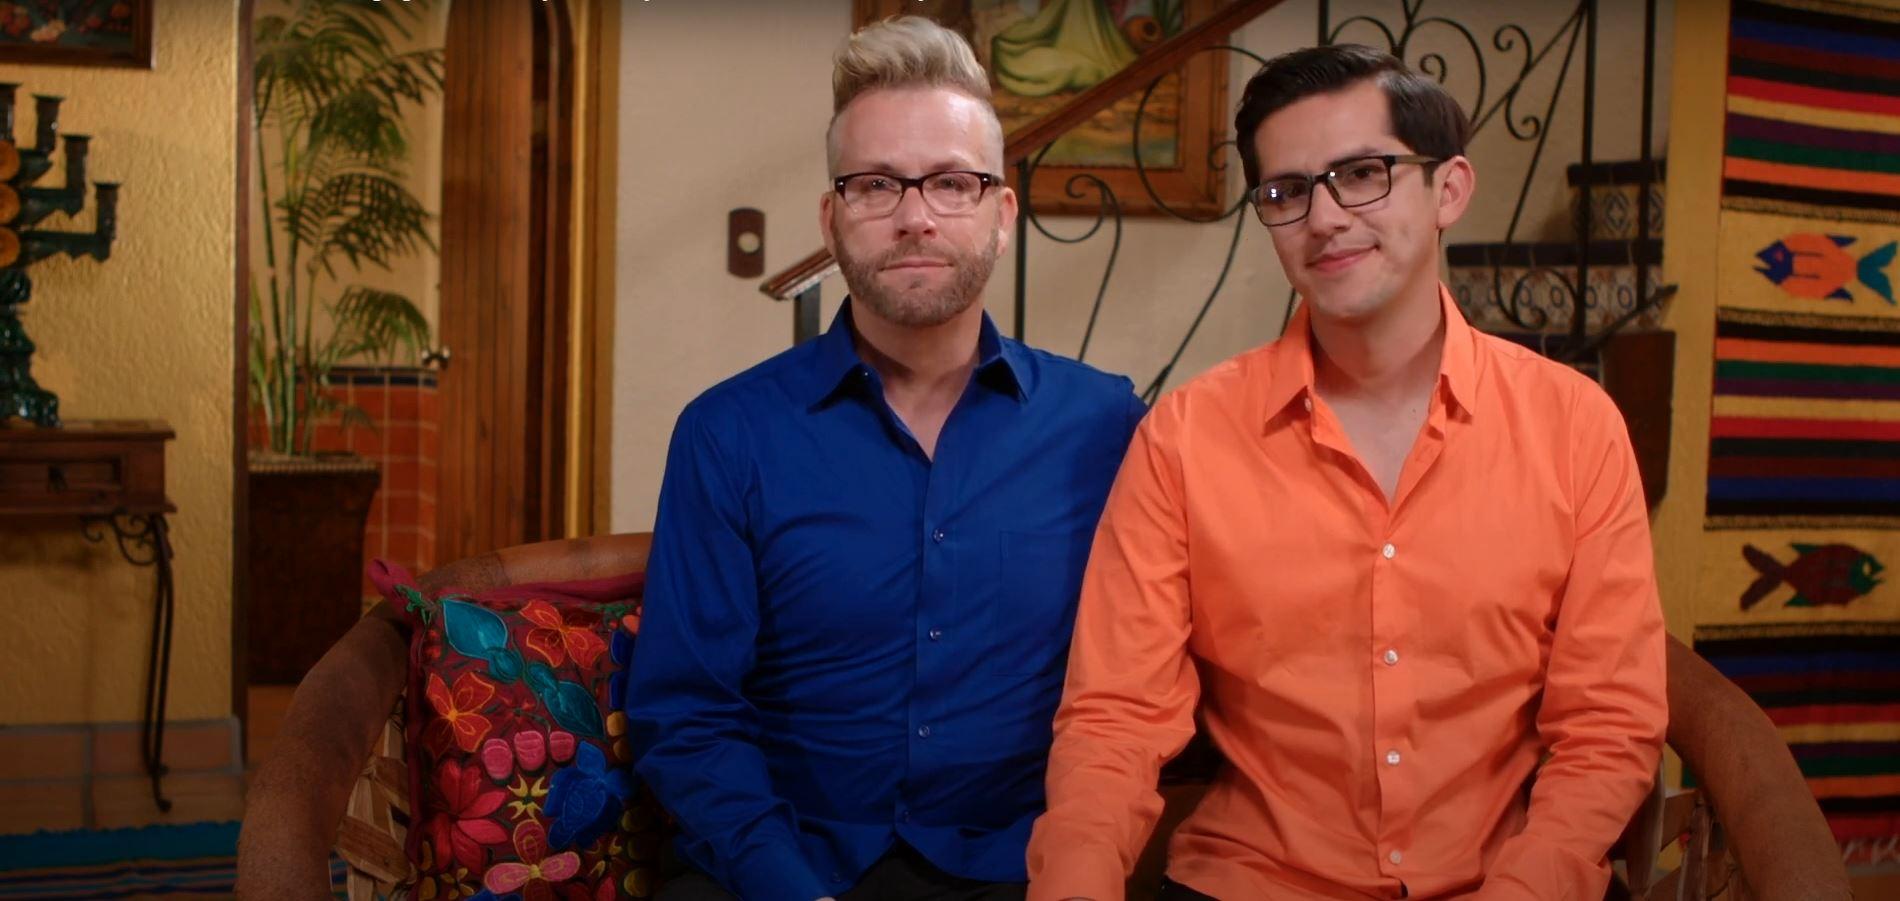 Kenneth and Armando on '90 Day Fiancé'